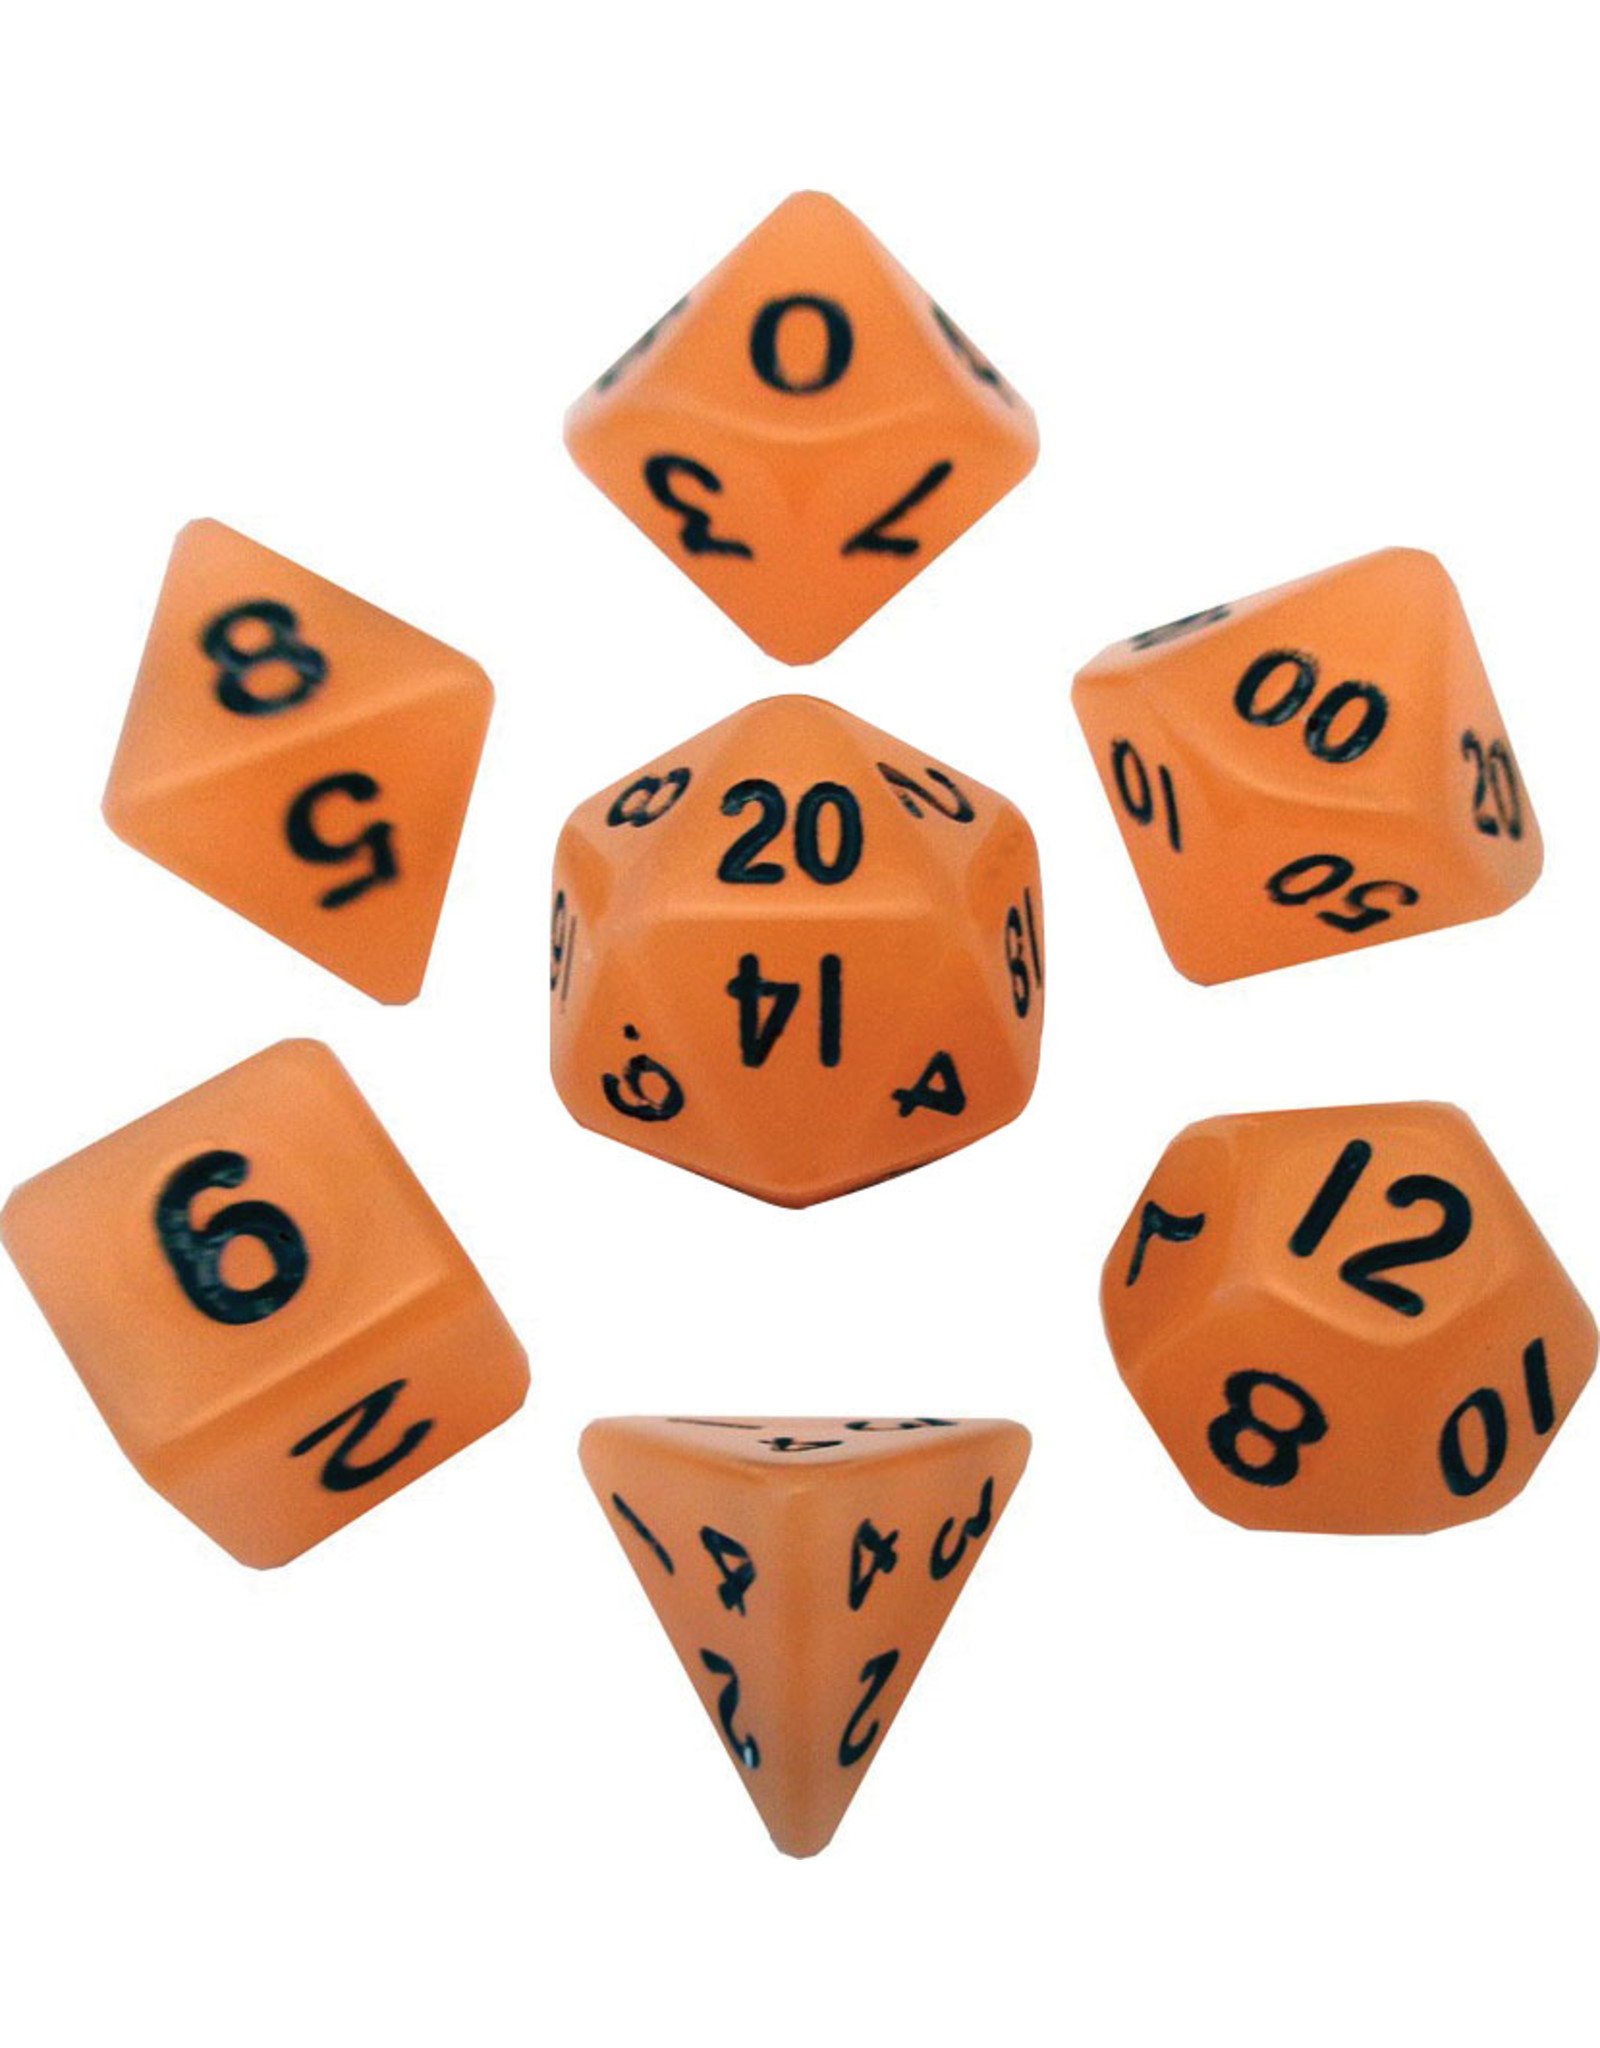 Metallic Dice Games Mini Polyhedral Dice Set: Glow Orange with Black Numbers